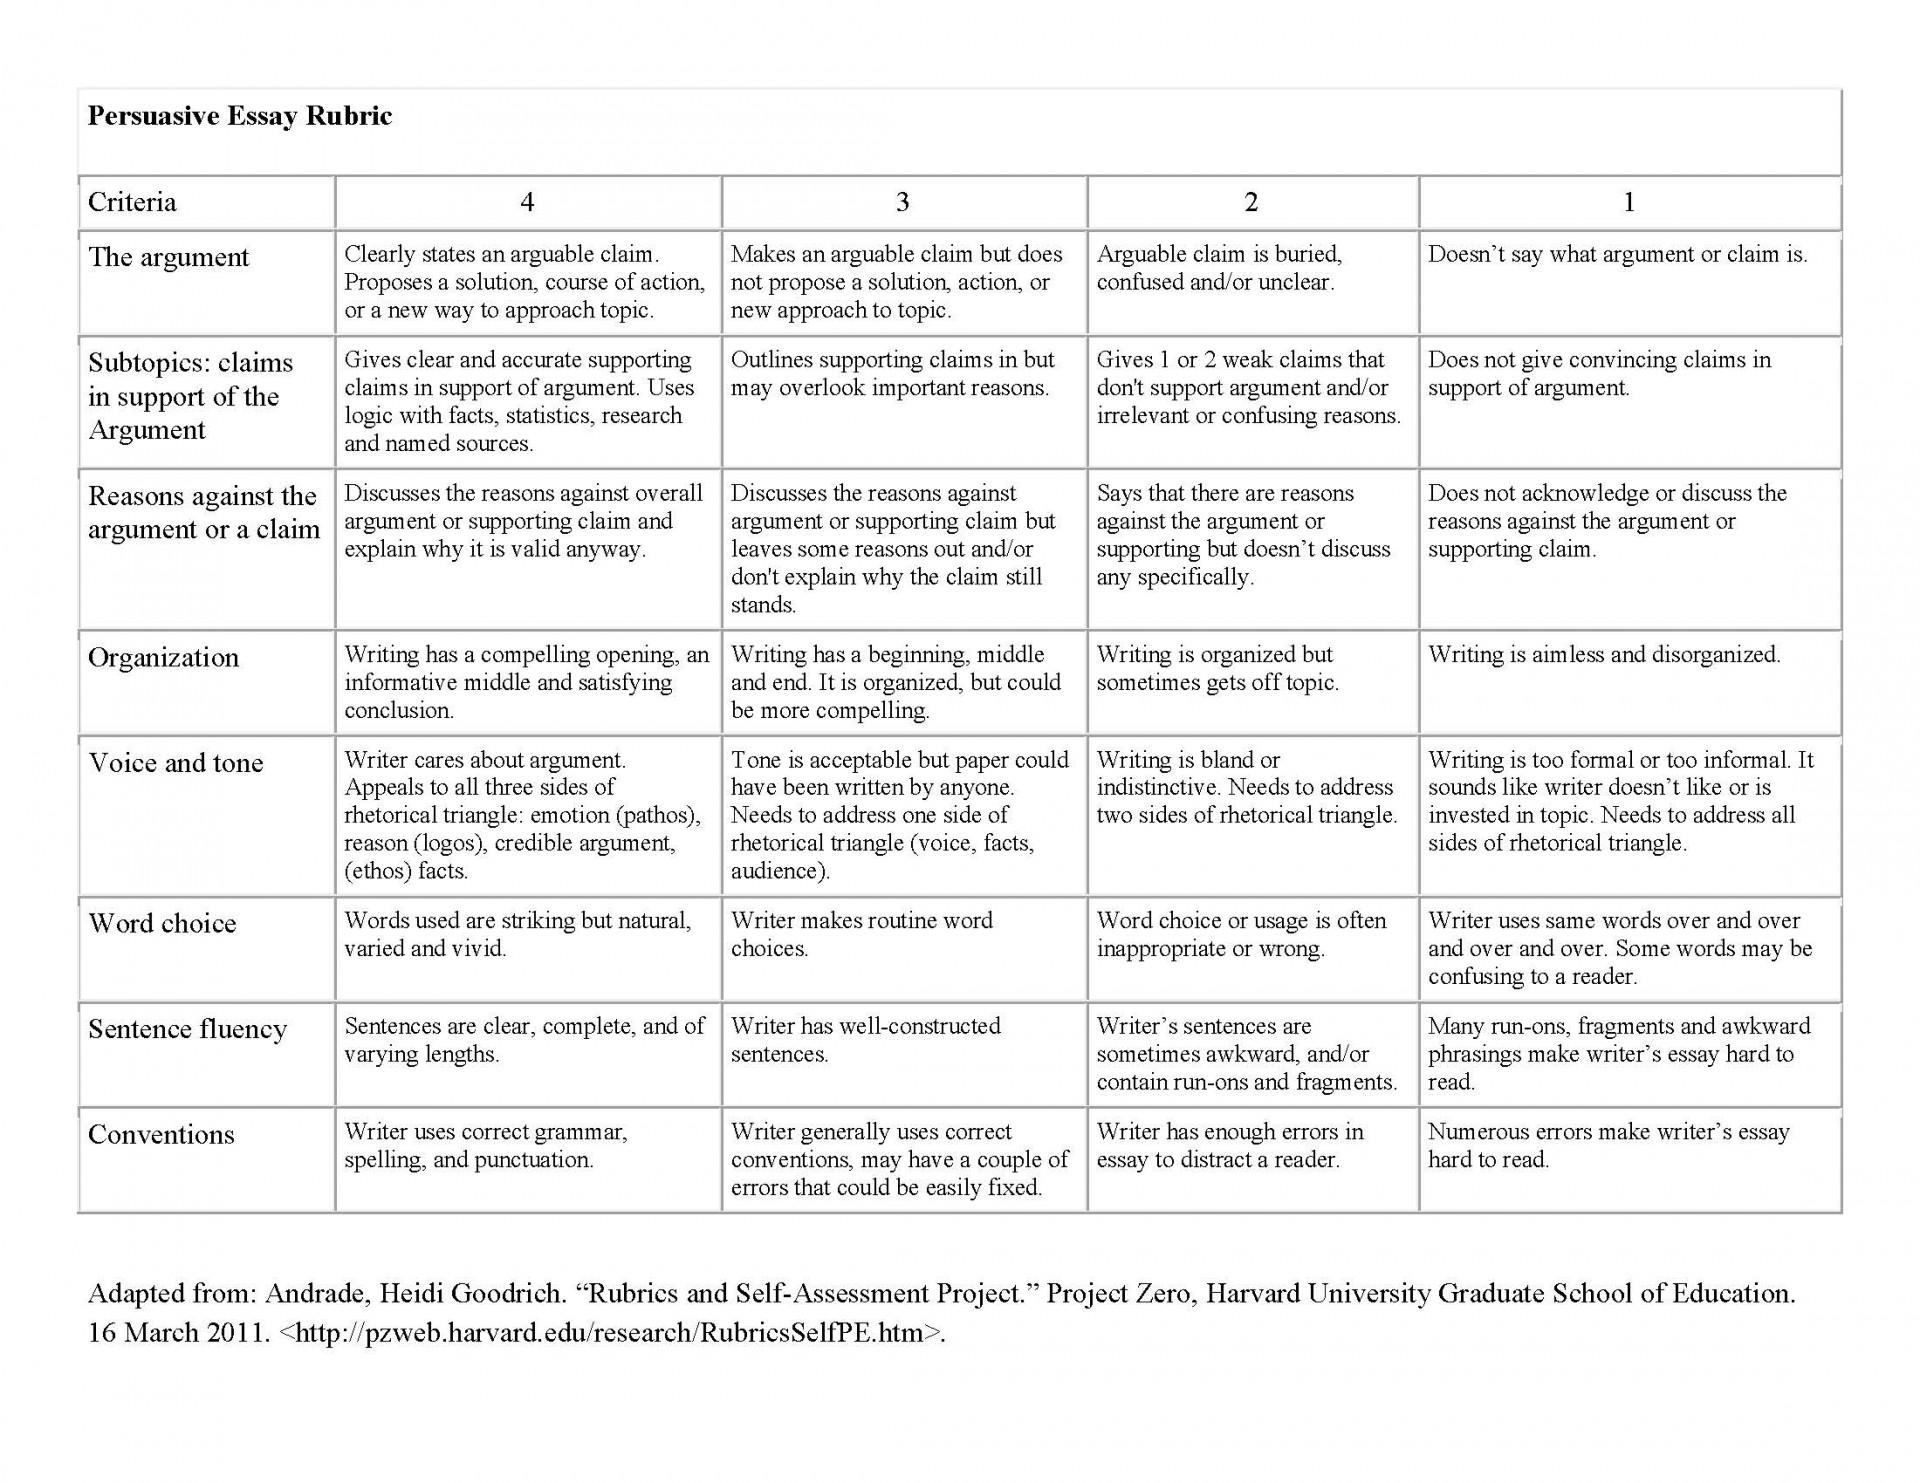 024 Handout Persuasive Essay Rubriccbu003d Example Argumentative Rare Prompts Topics For 7th Graders College High School Pdf 1920